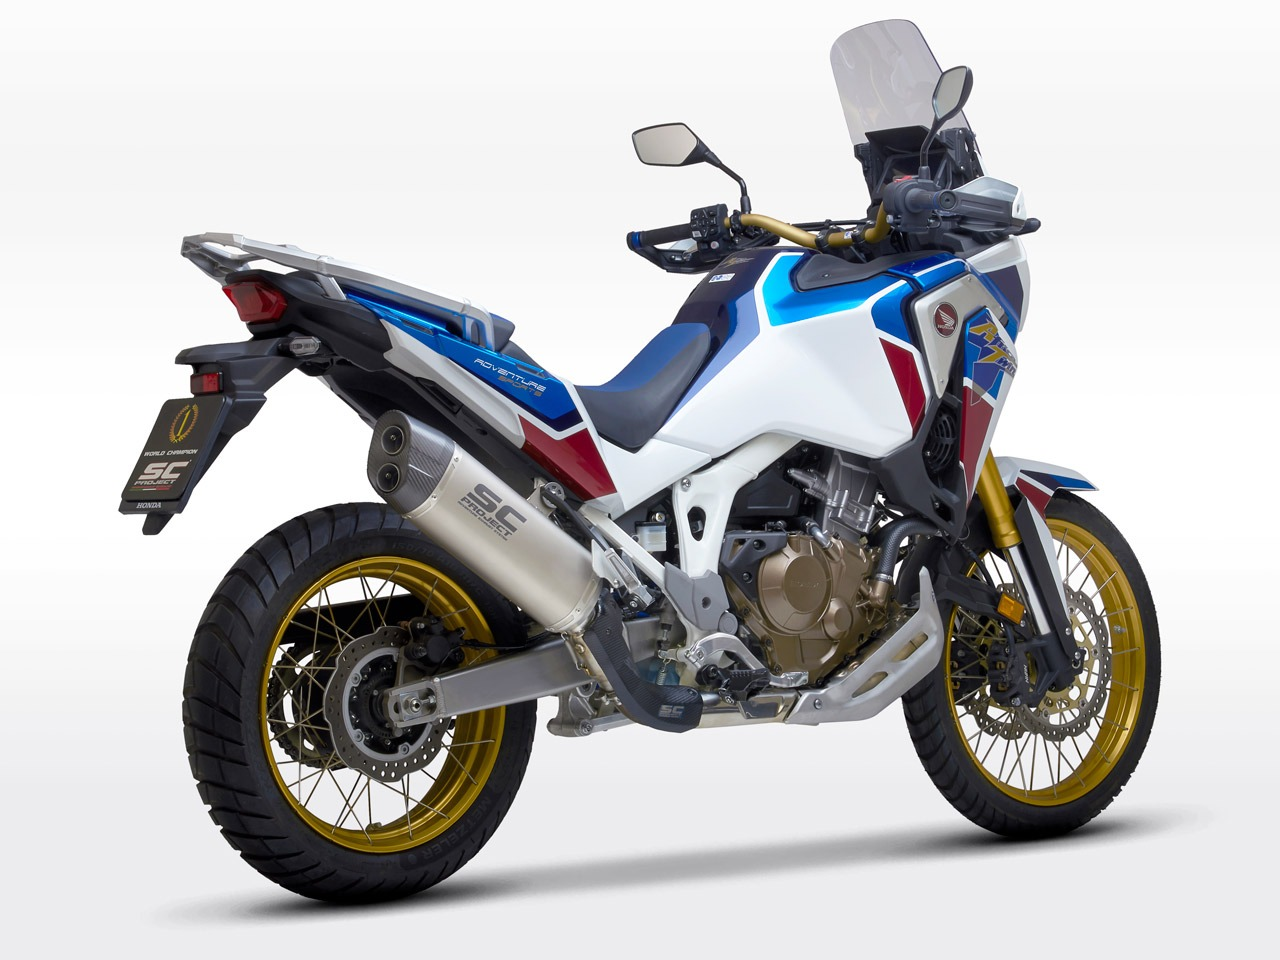 Honda_CRF1100L-AfricaTwin_my2021_Adventure-Titanio_3-4Posteriore_1280x960px_web-partnership